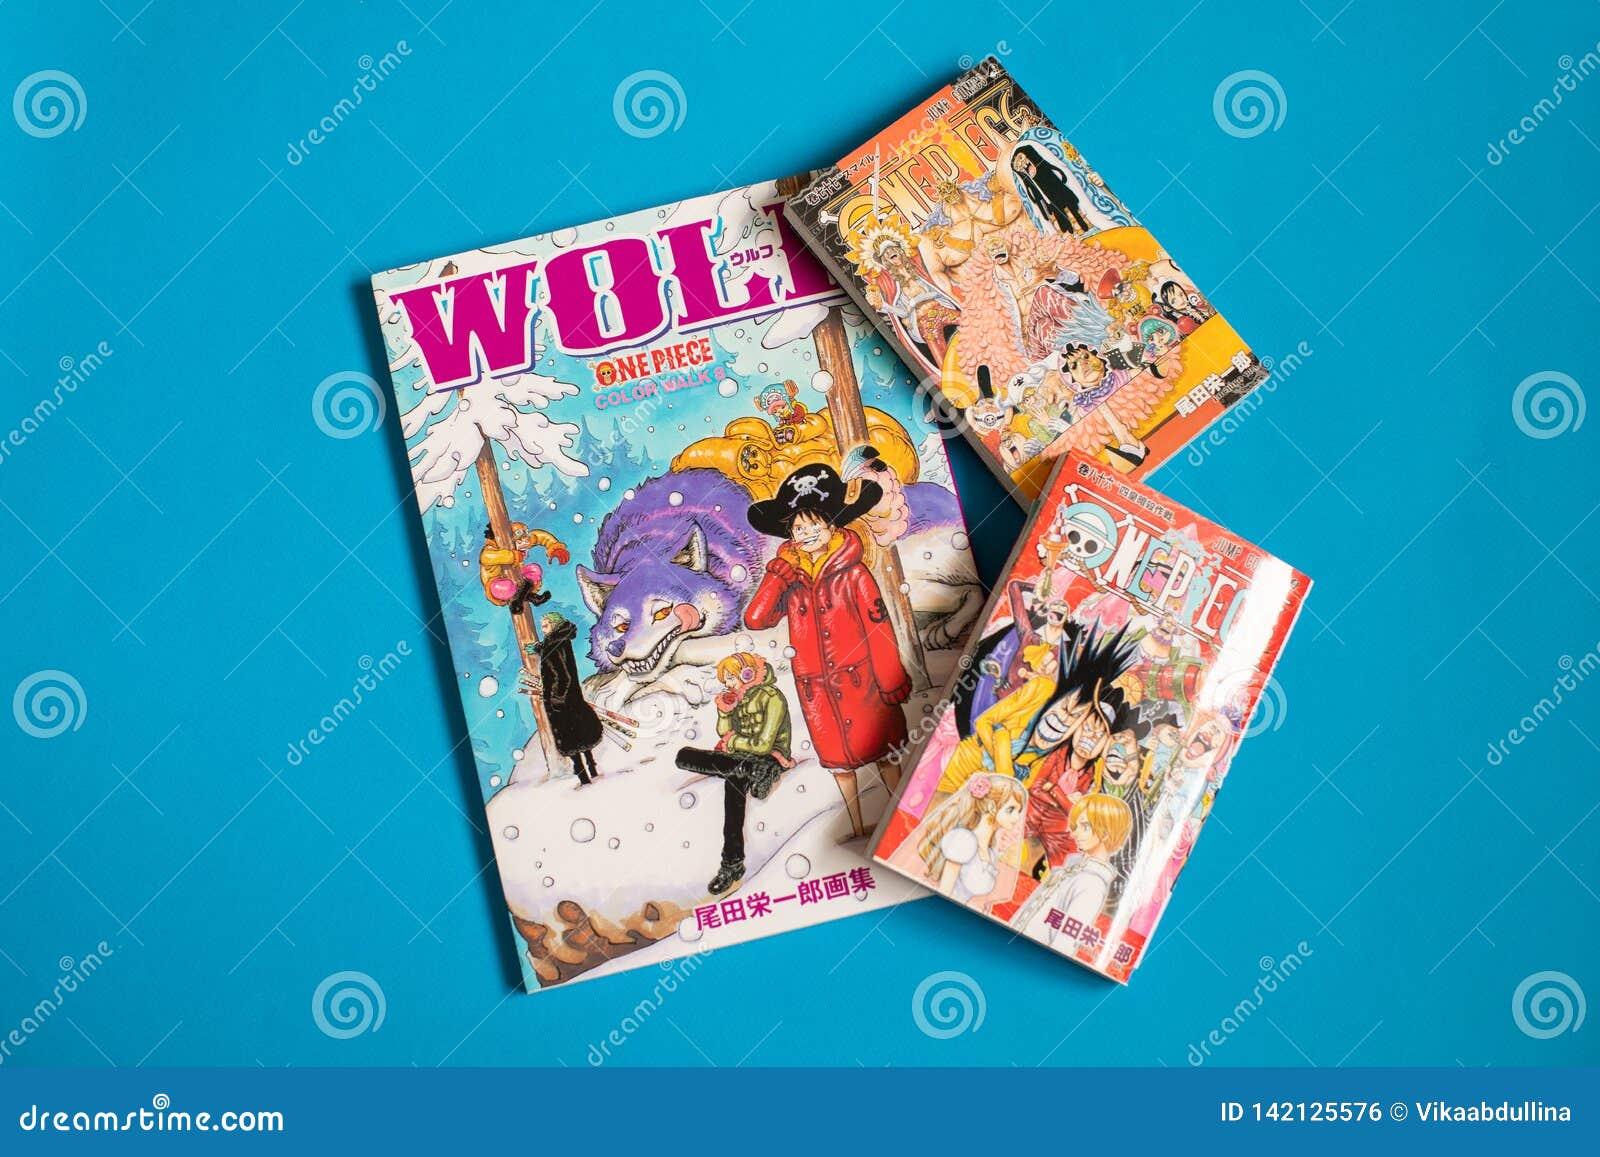 Pedazo japonés de Manga One - cómic publicado en revista semanal del salto de Shonen